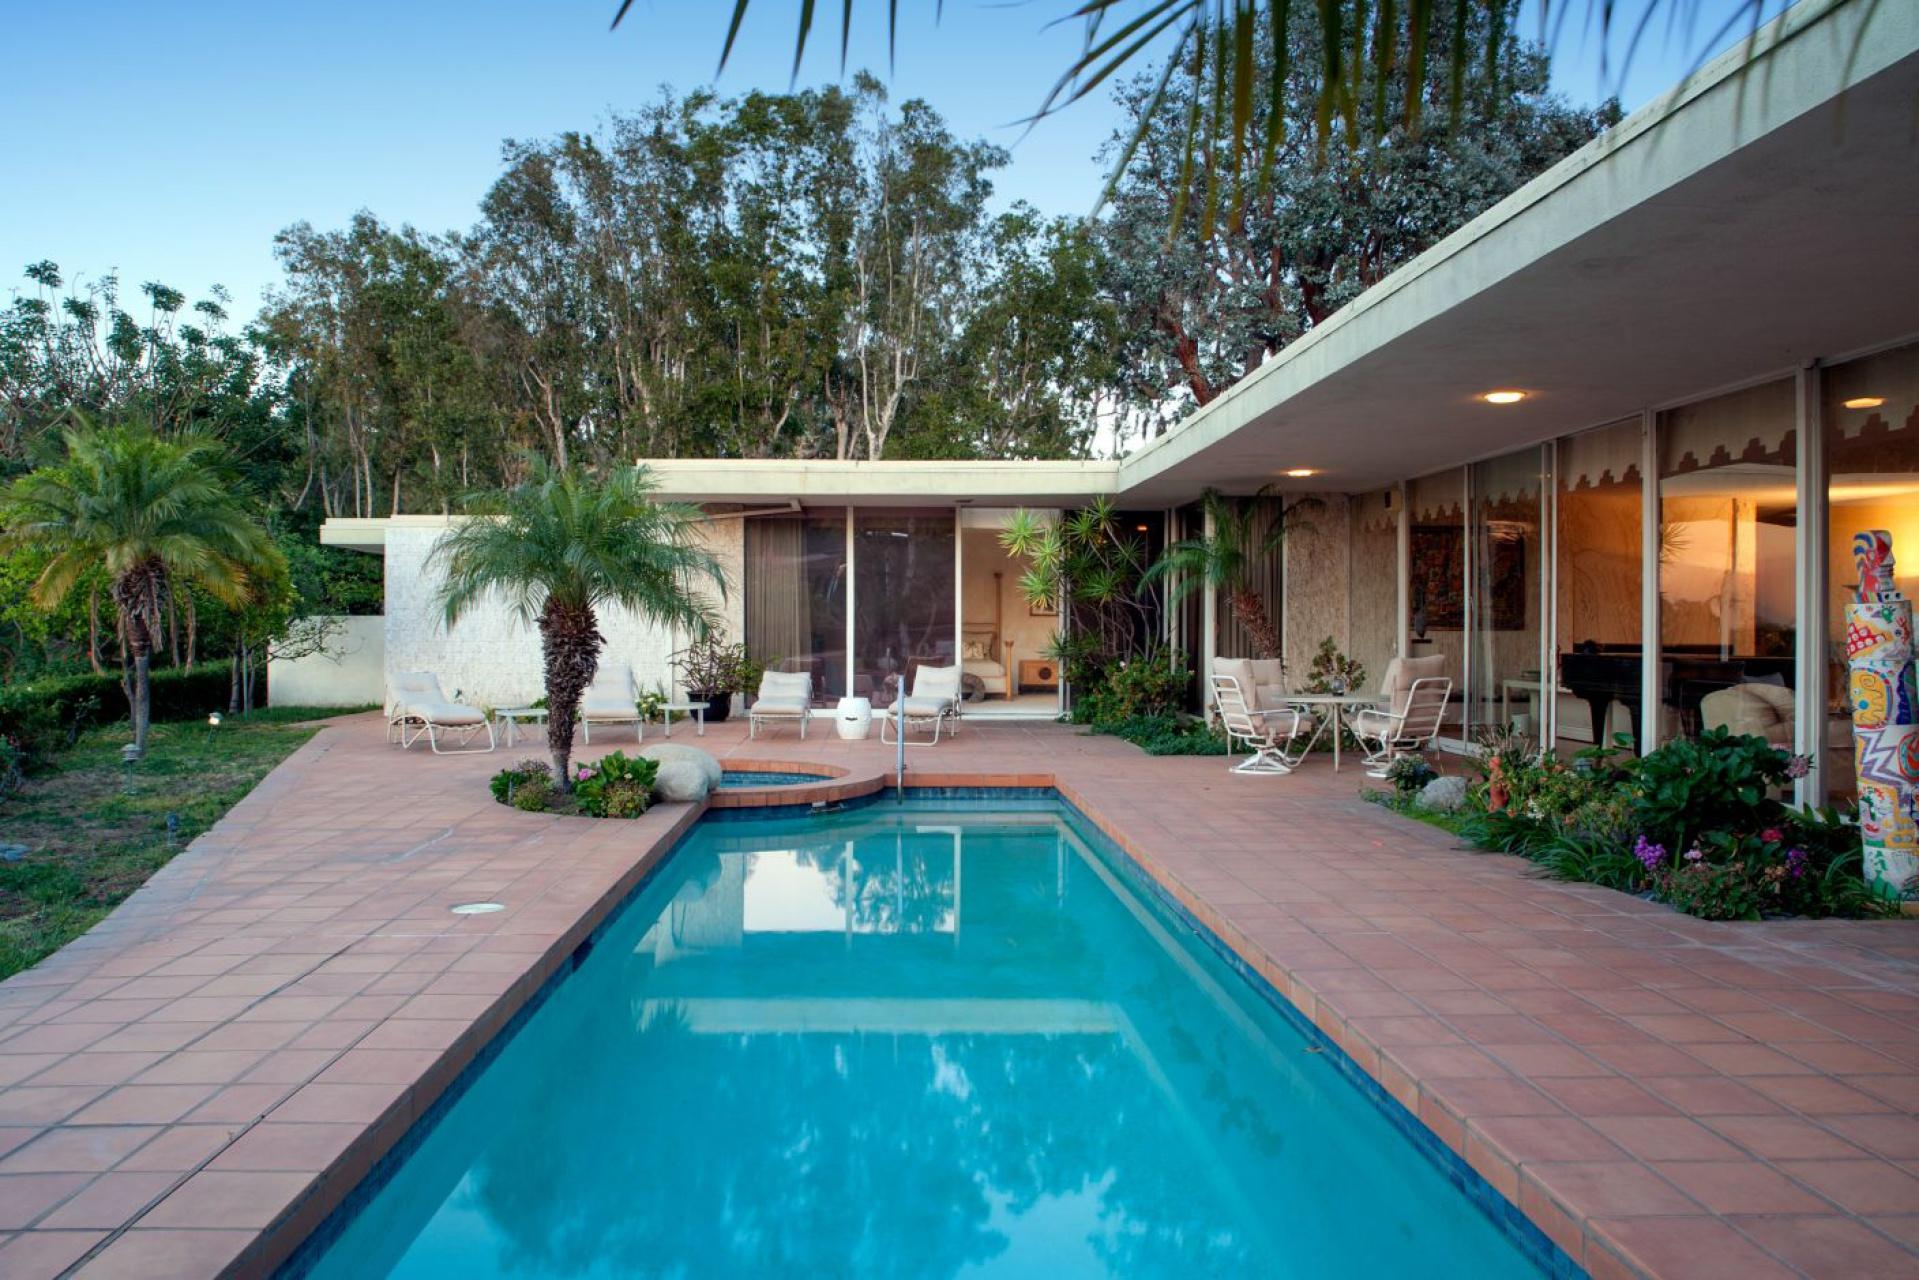 Benton & Park, 1969   |   Trousdale Estates Beverly Hills CA  | Jonah Wilson